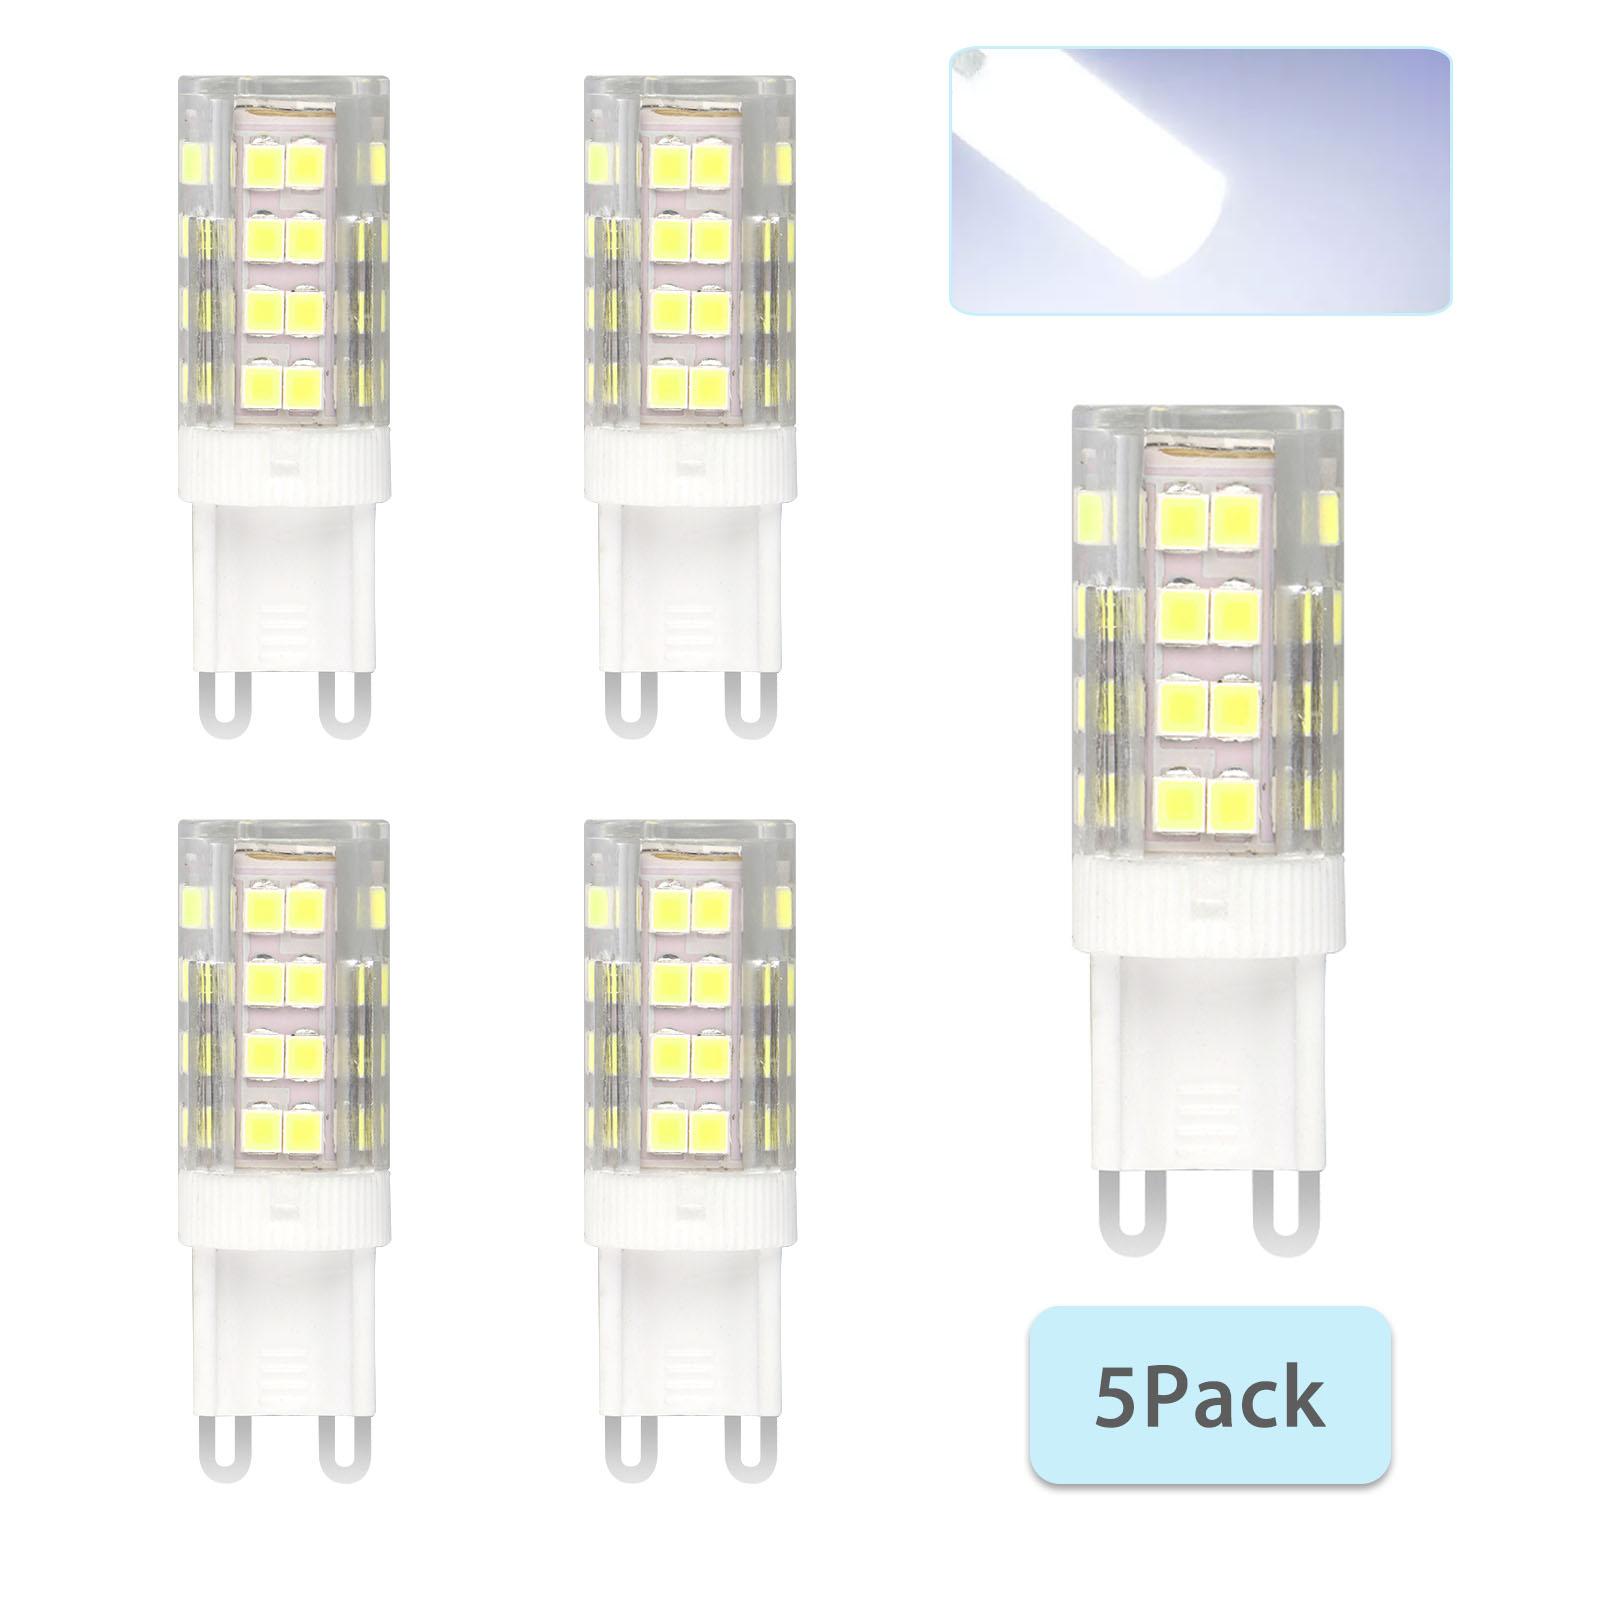 G9-40W-Dimmable-Halogen-LED-Corn-Bulb-Lamp-6000K-2835-40-SMD-Daylight-Home-Light thumbnail 10